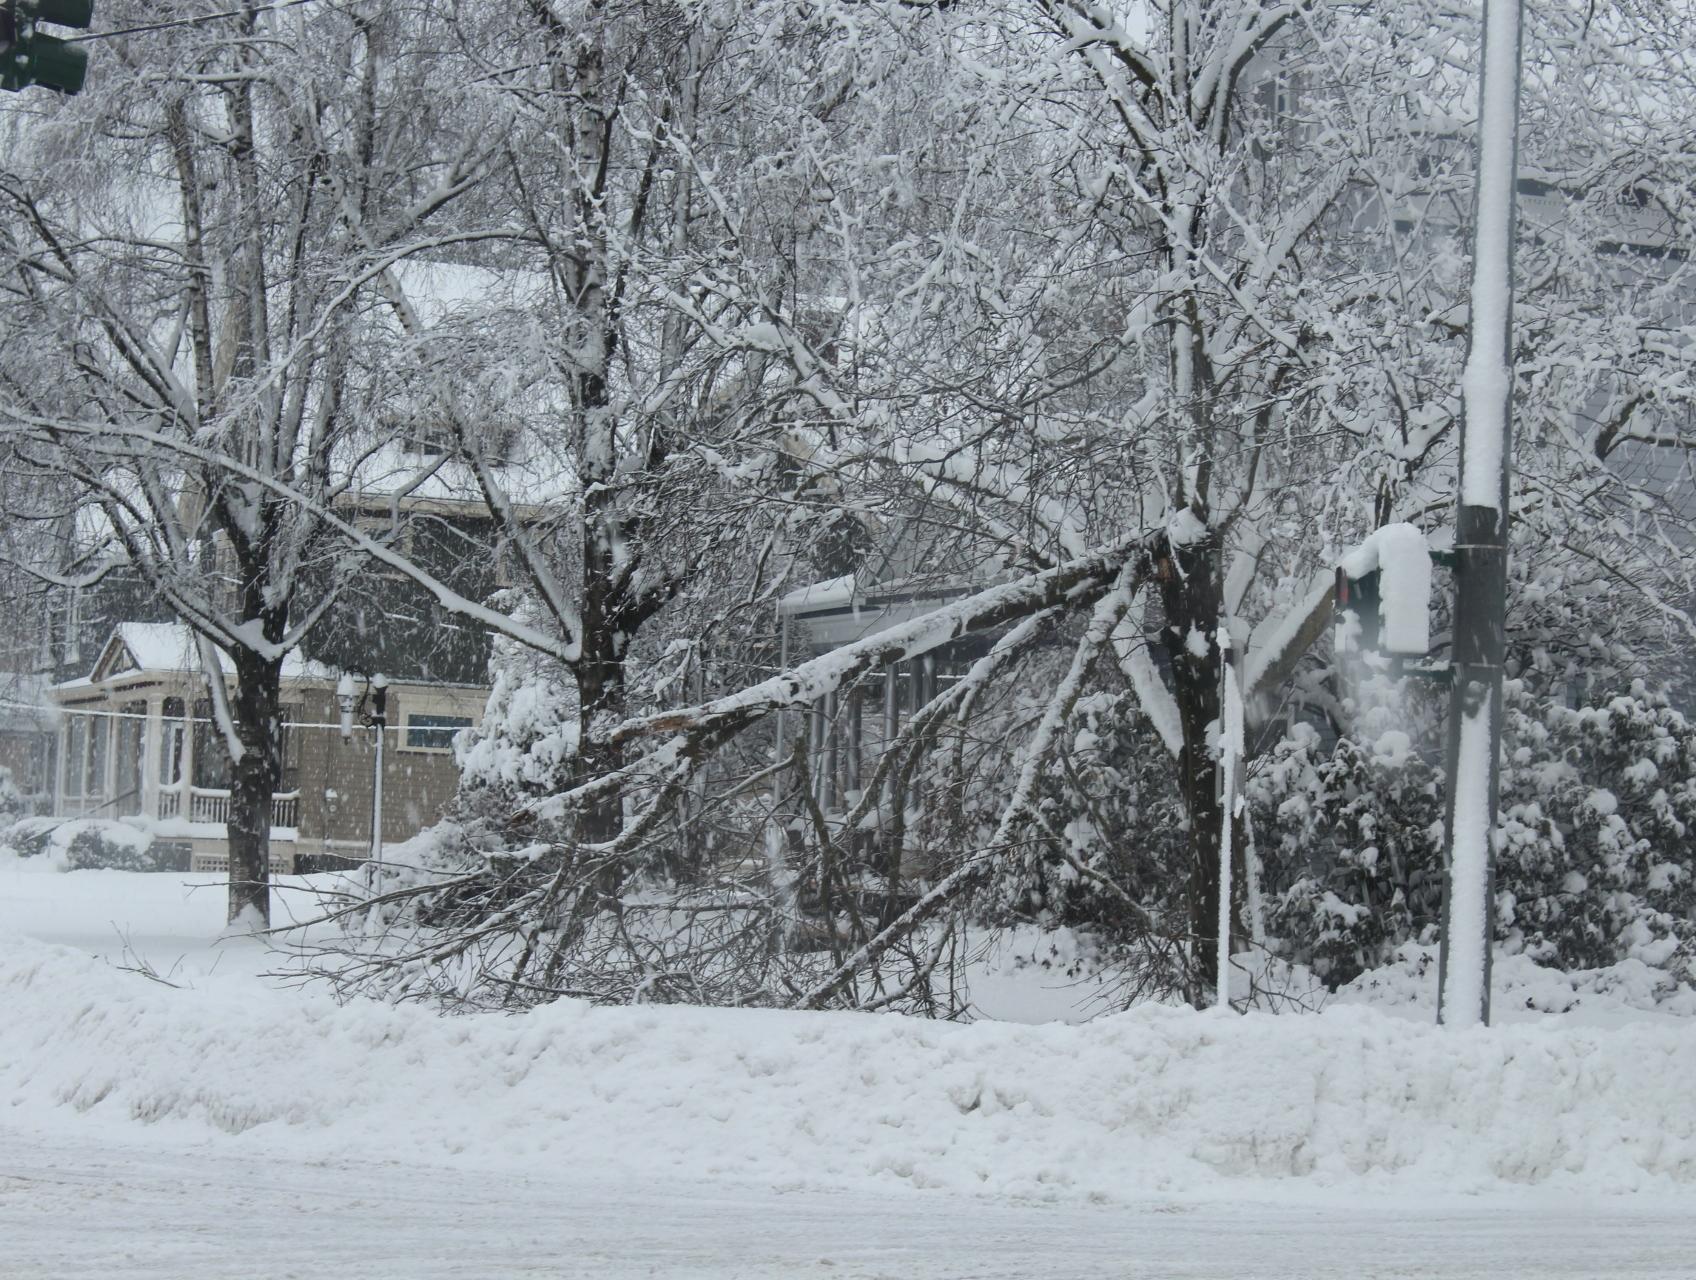 Intersection of Prospect St & Kingsboro Ave in Gloversville